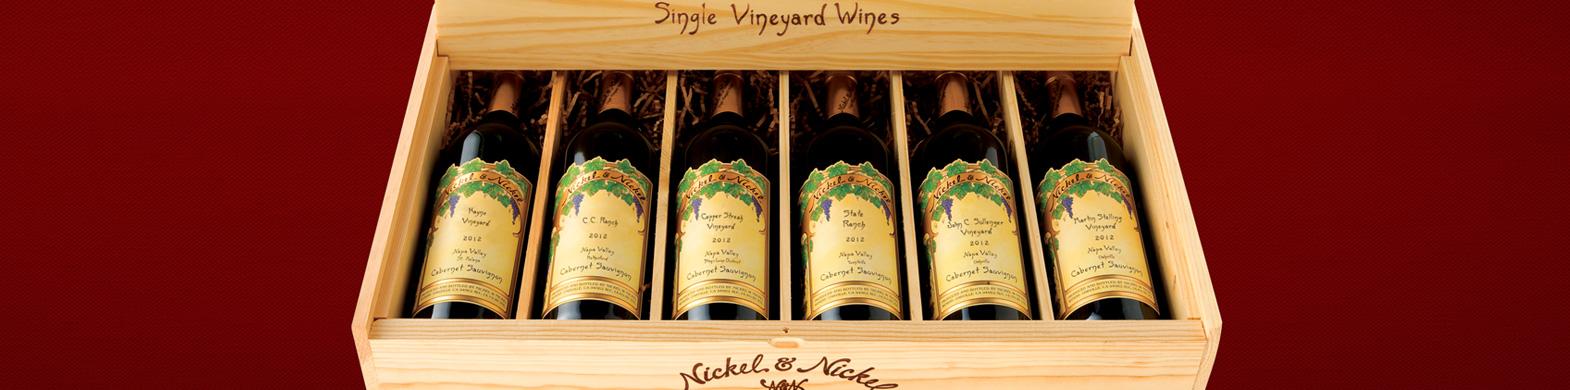 Wine Club Gift: Distinctive Wine Gifts